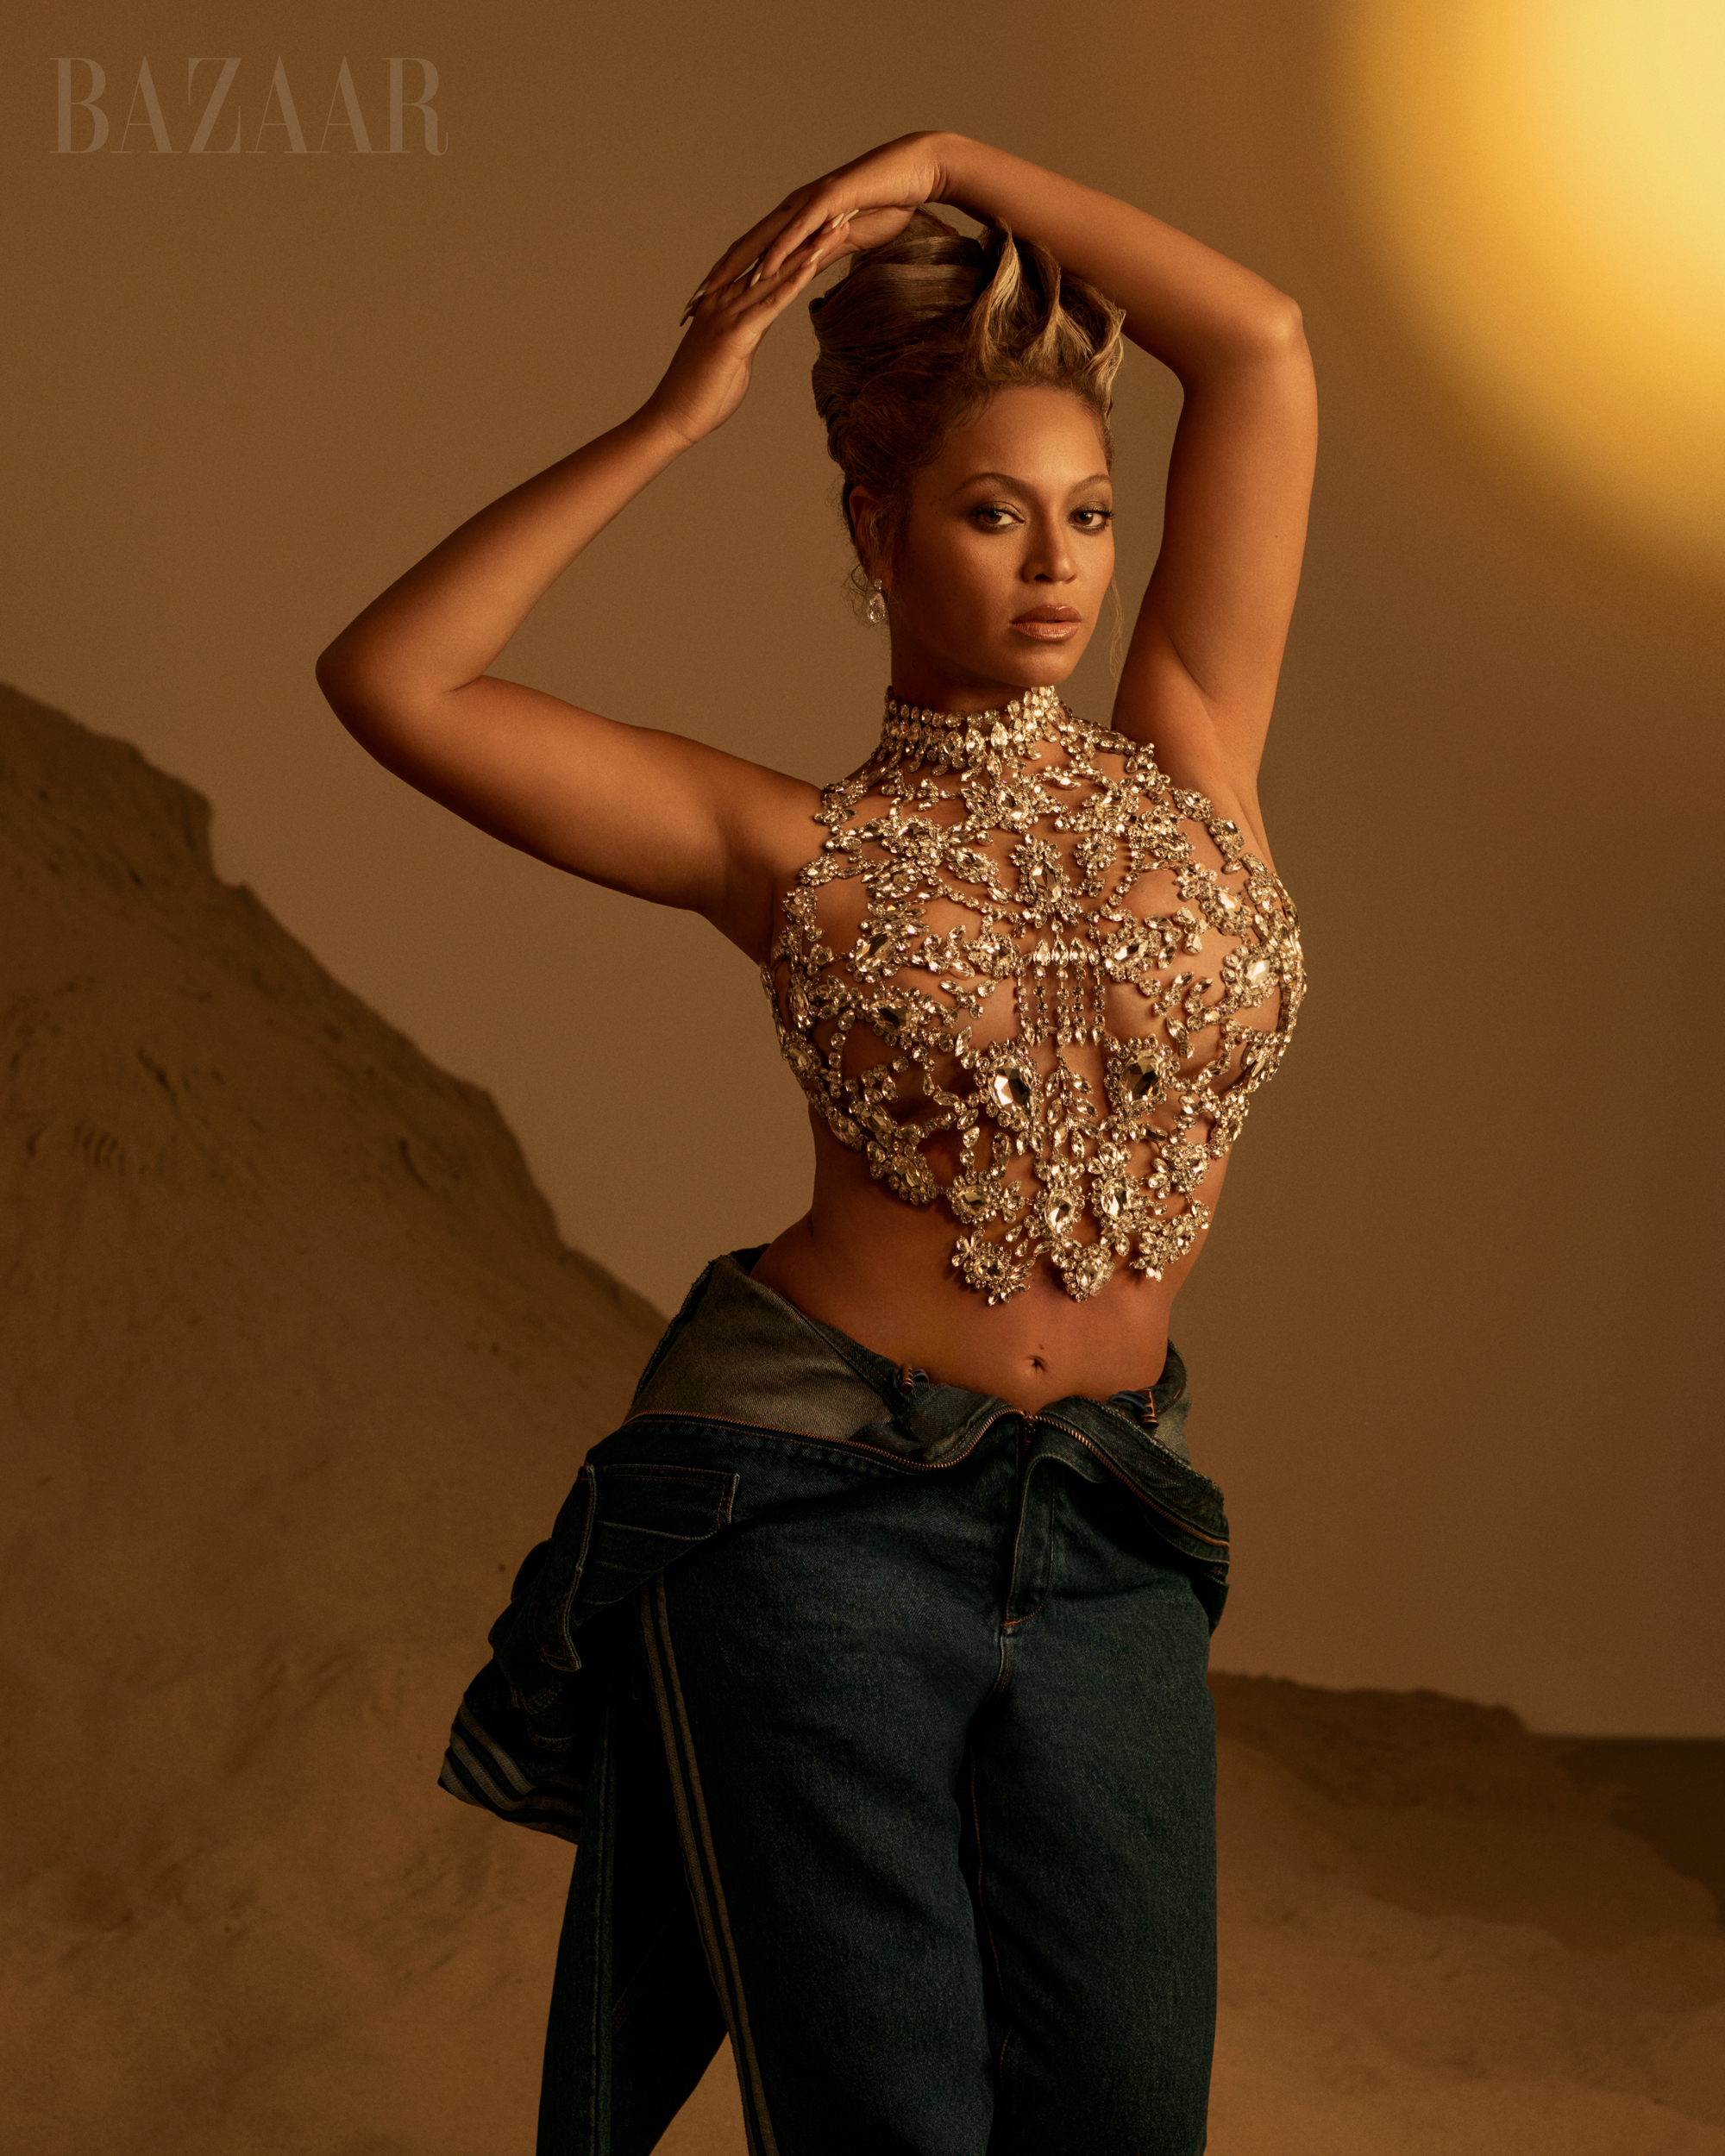 Beyoncé talks about setting boundaries and healing 'generational trauma'